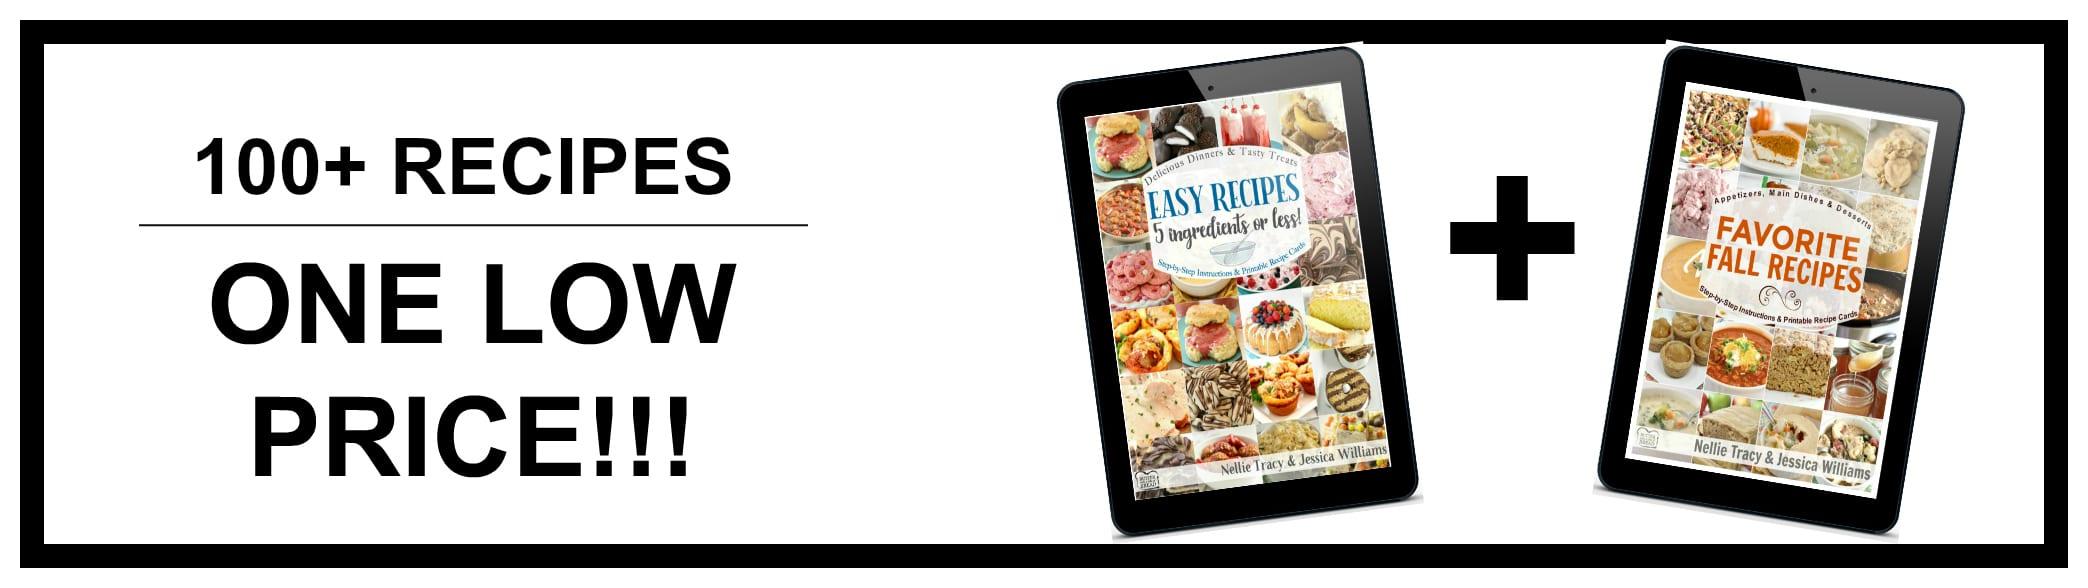 Easy Recipes and Fall Recipes Bundle Ad